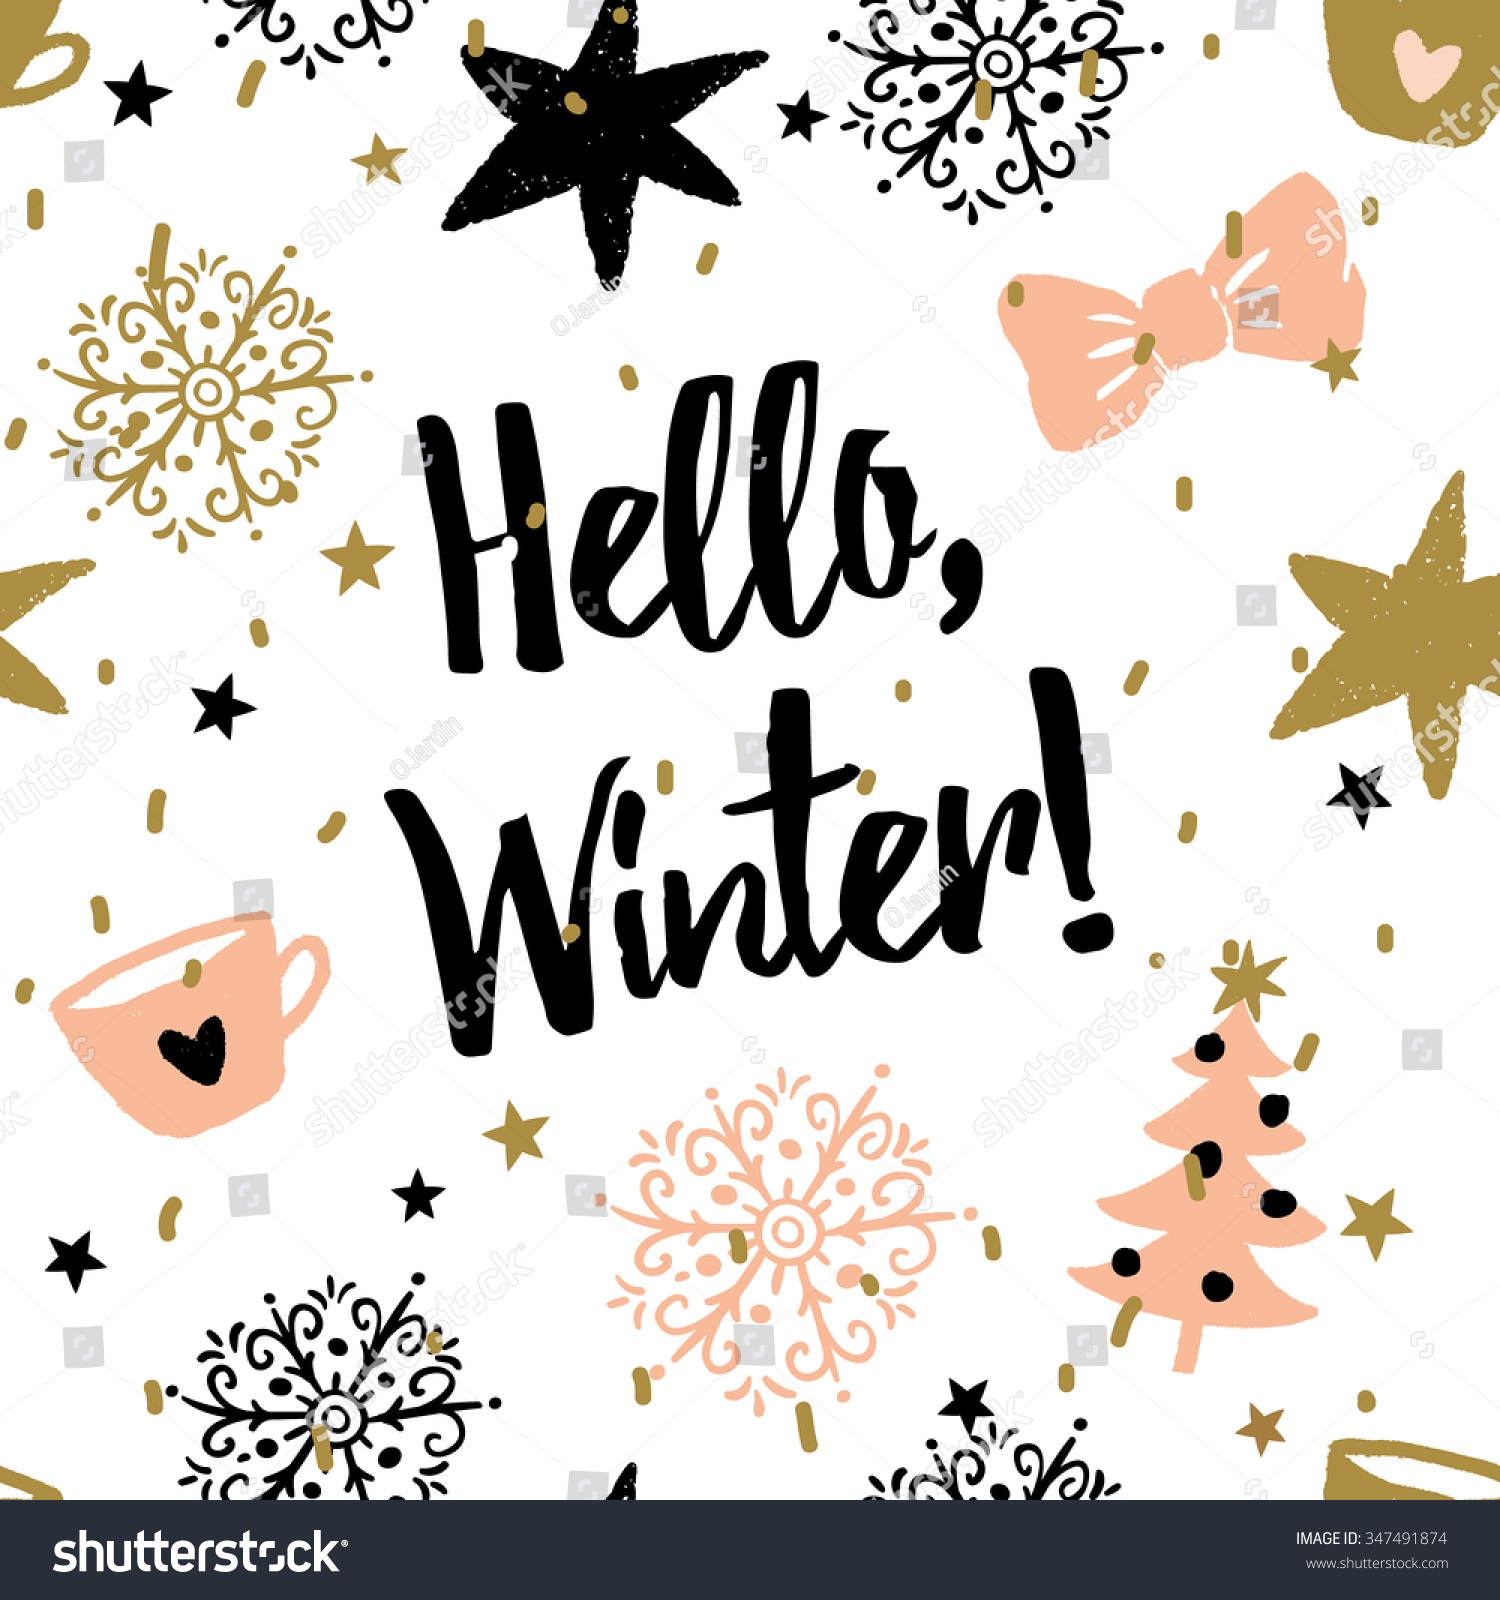 Golden tree wallpaper desktop wallpaper - Christmas Illustration With Message Hello Winter Vector